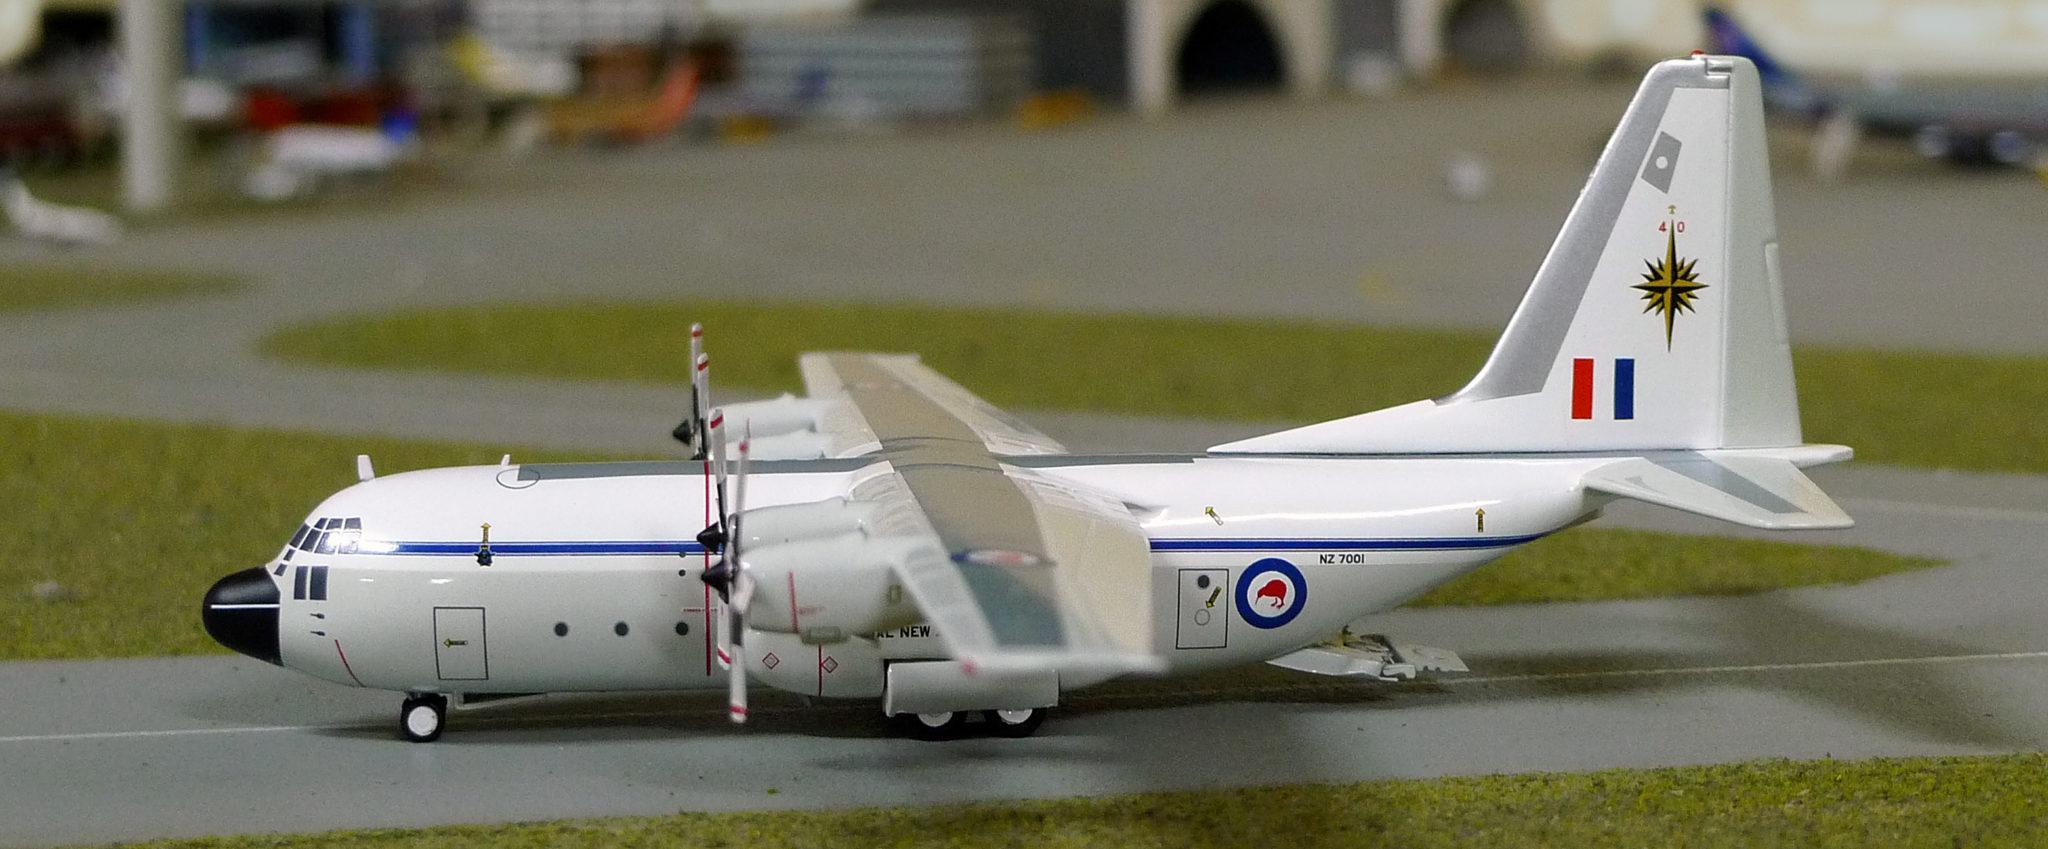 INFLIGHT200 IF1300216 RNZAF C-130H NZ7001